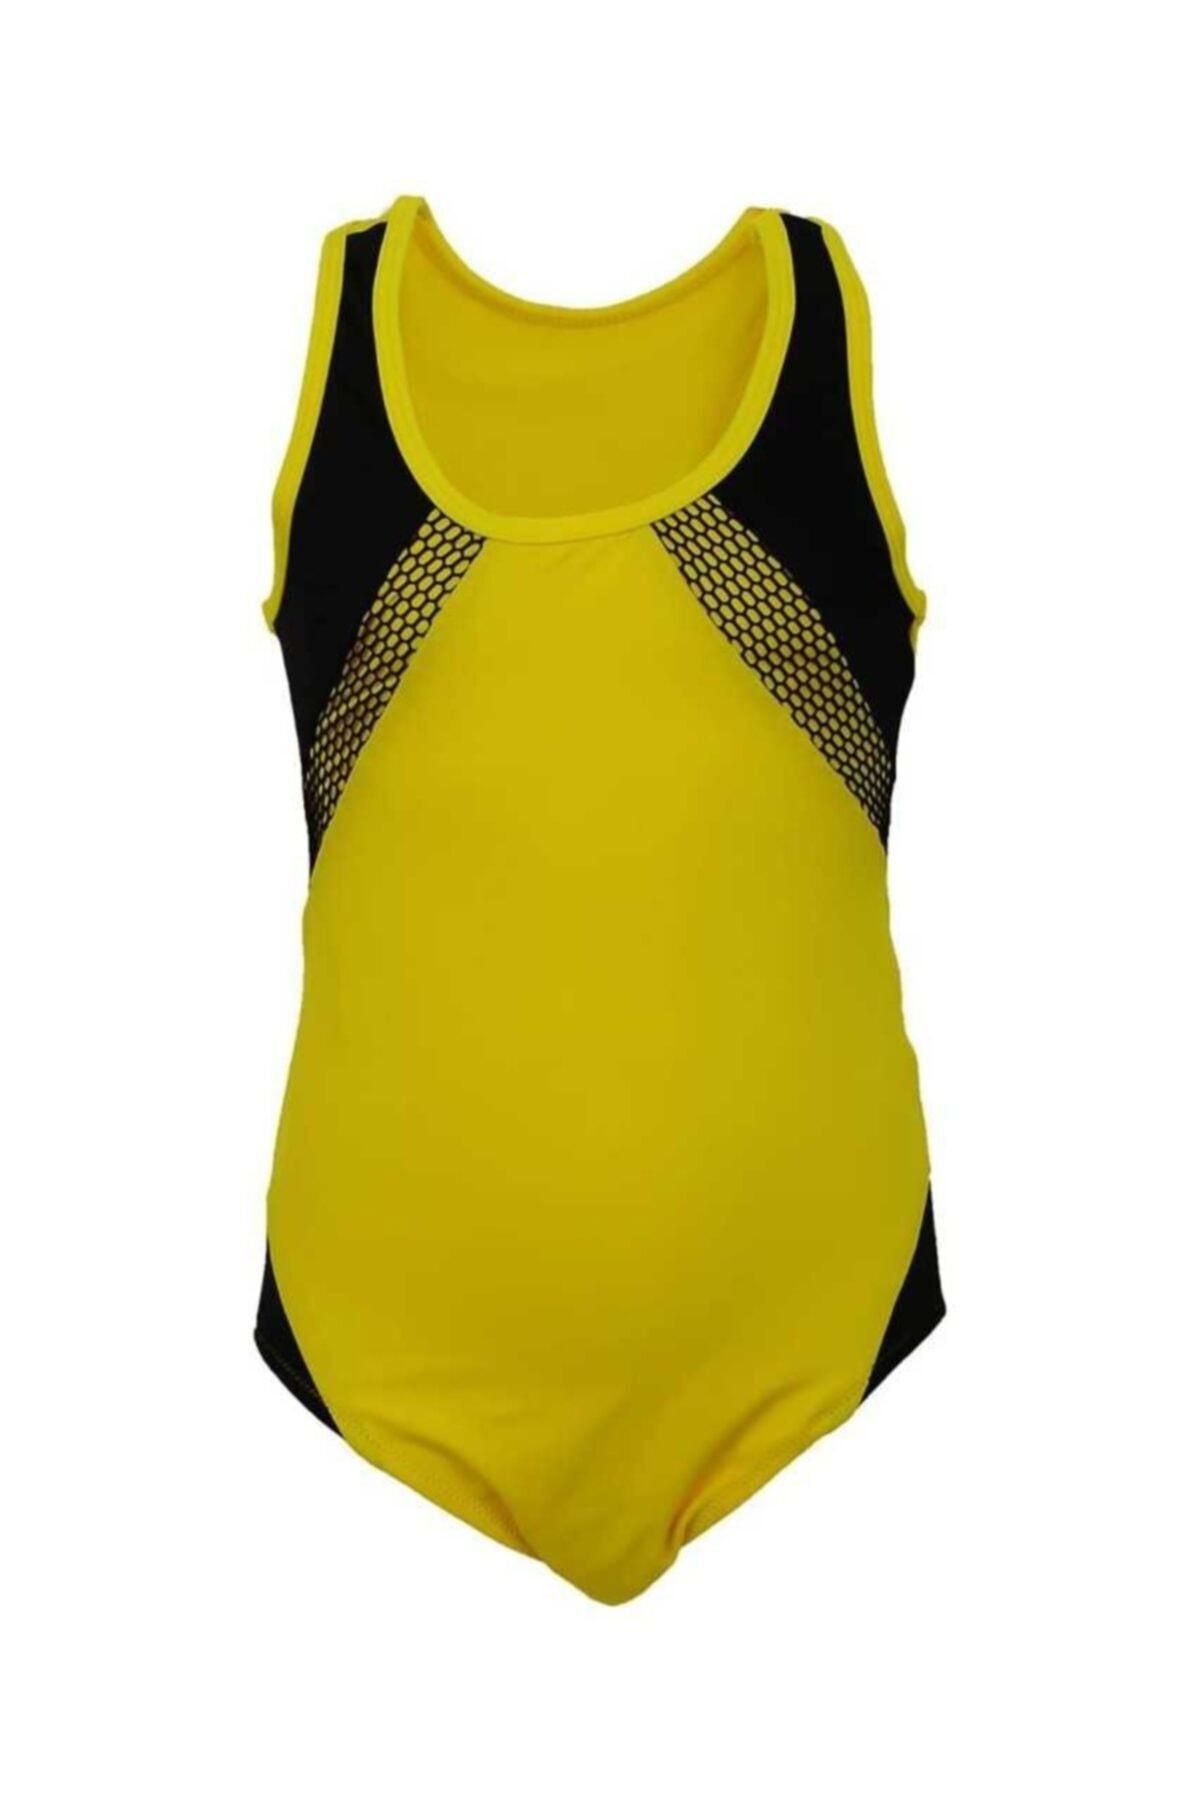 Kız Çocuk Sarı Yüzücü Mayo